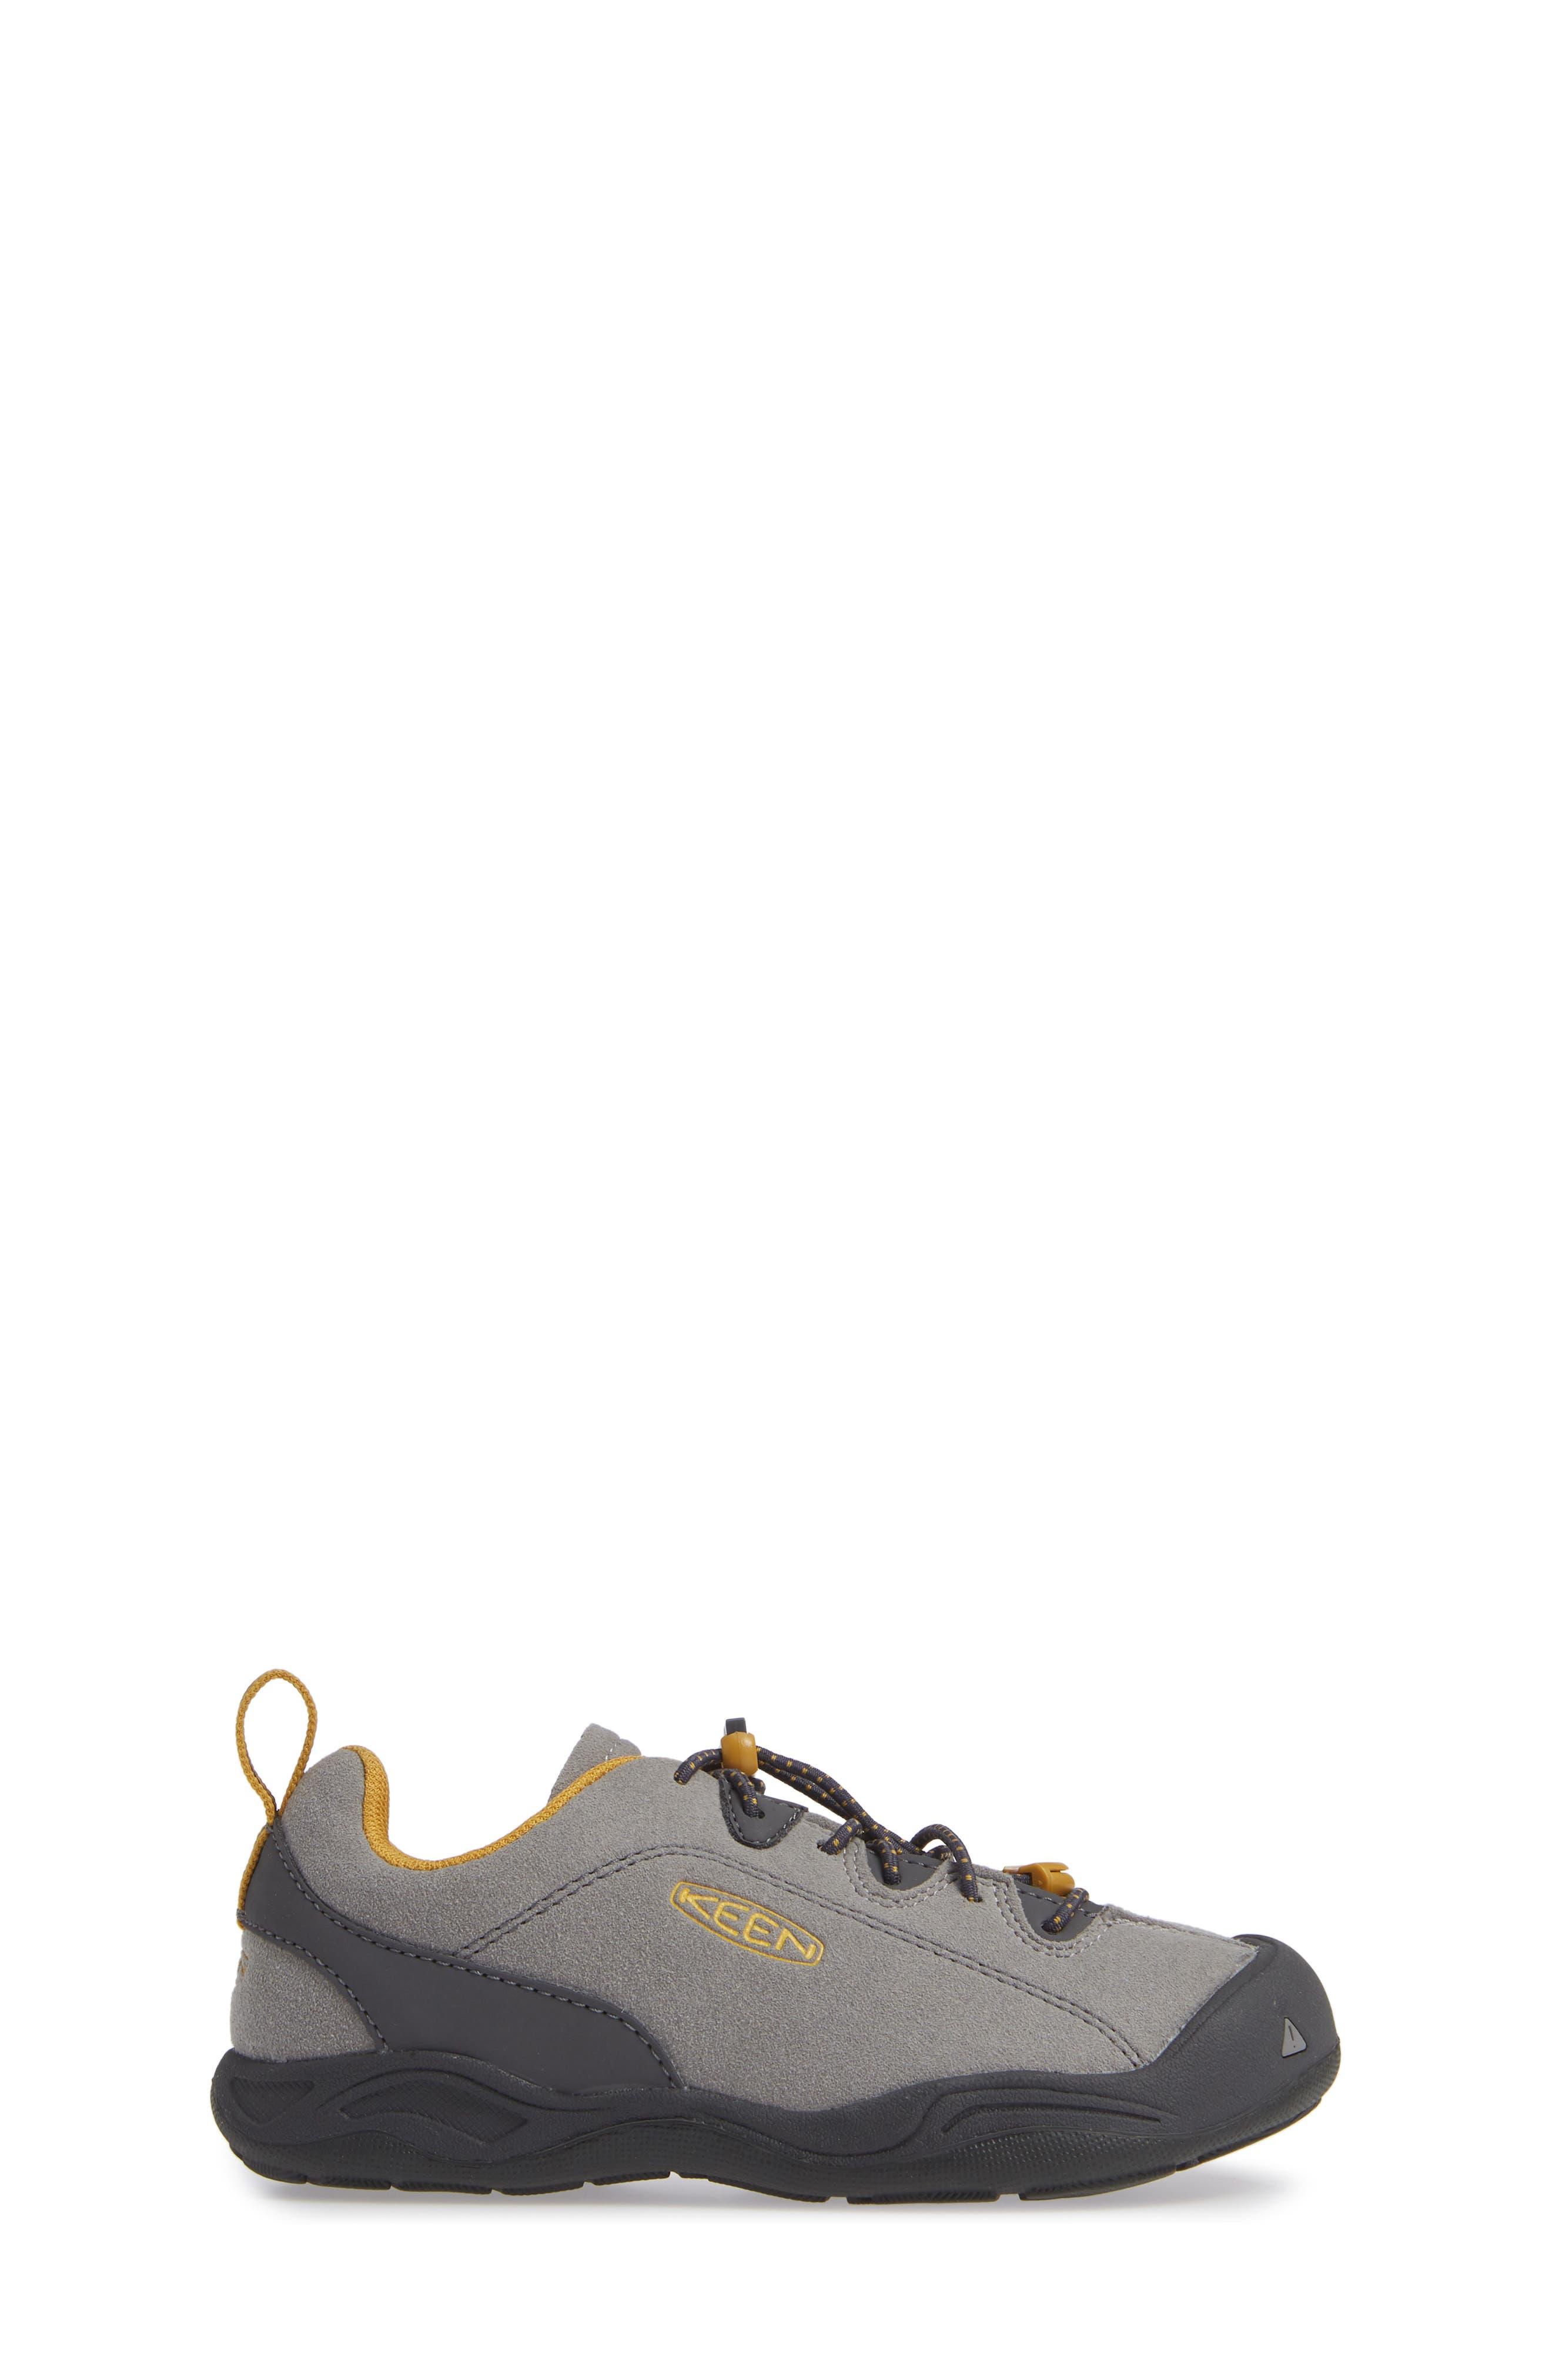 Jasper Sneaker,                             Alternate thumbnail 3, color,                             GREY/ ARROWWOOD